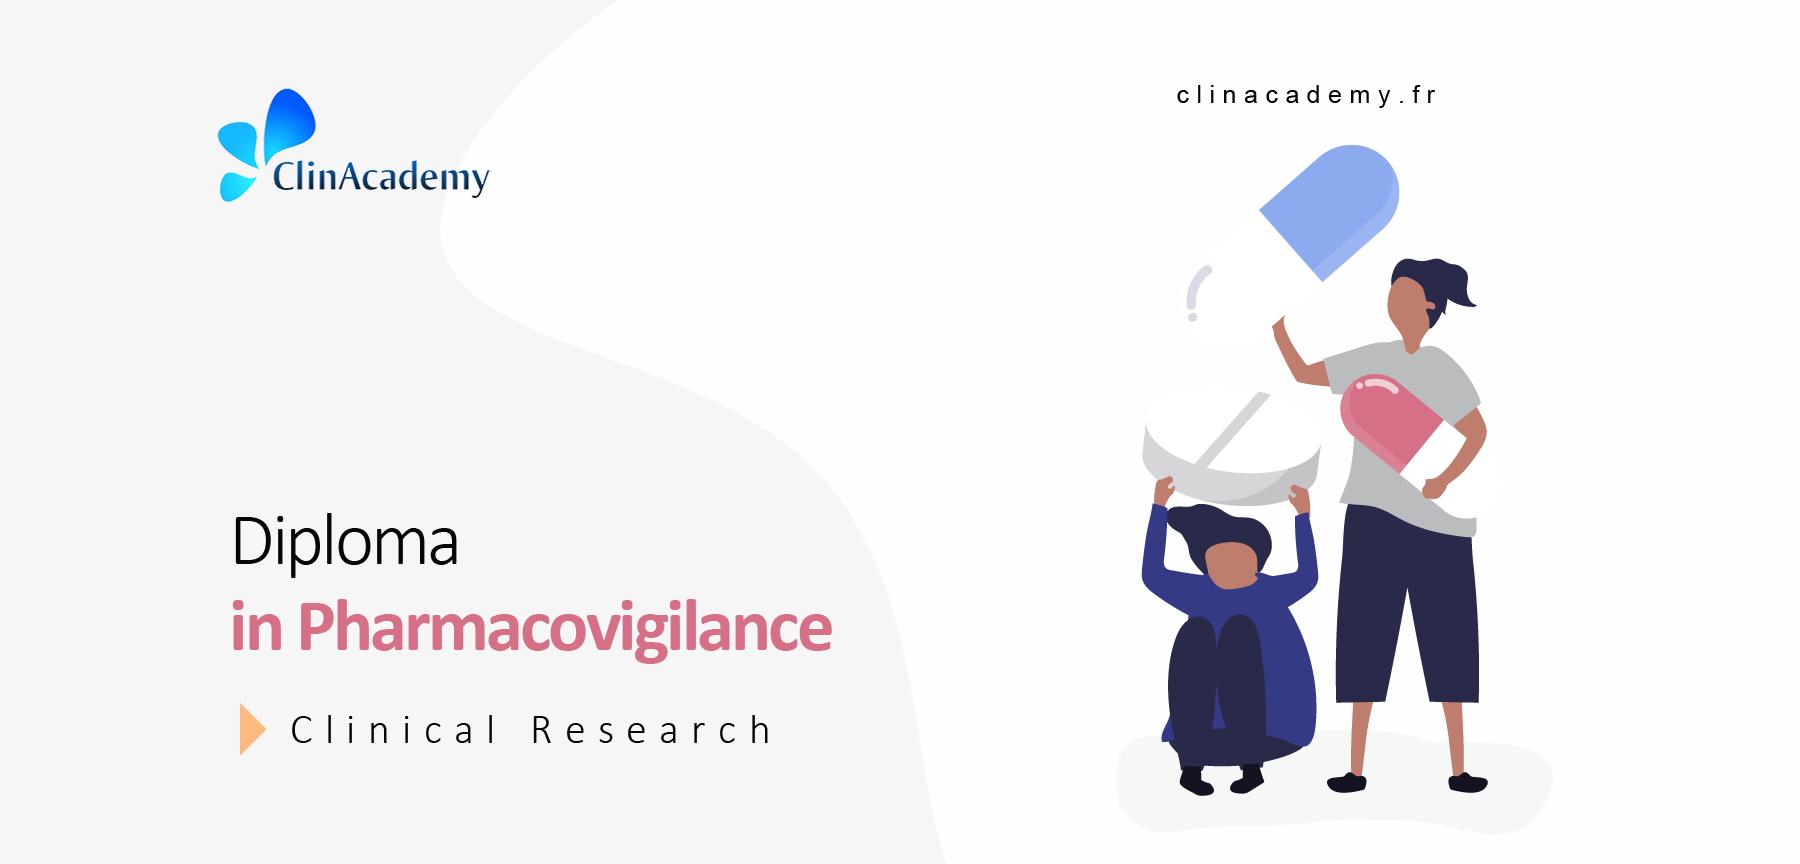 Diploma in Pharmacovigilance